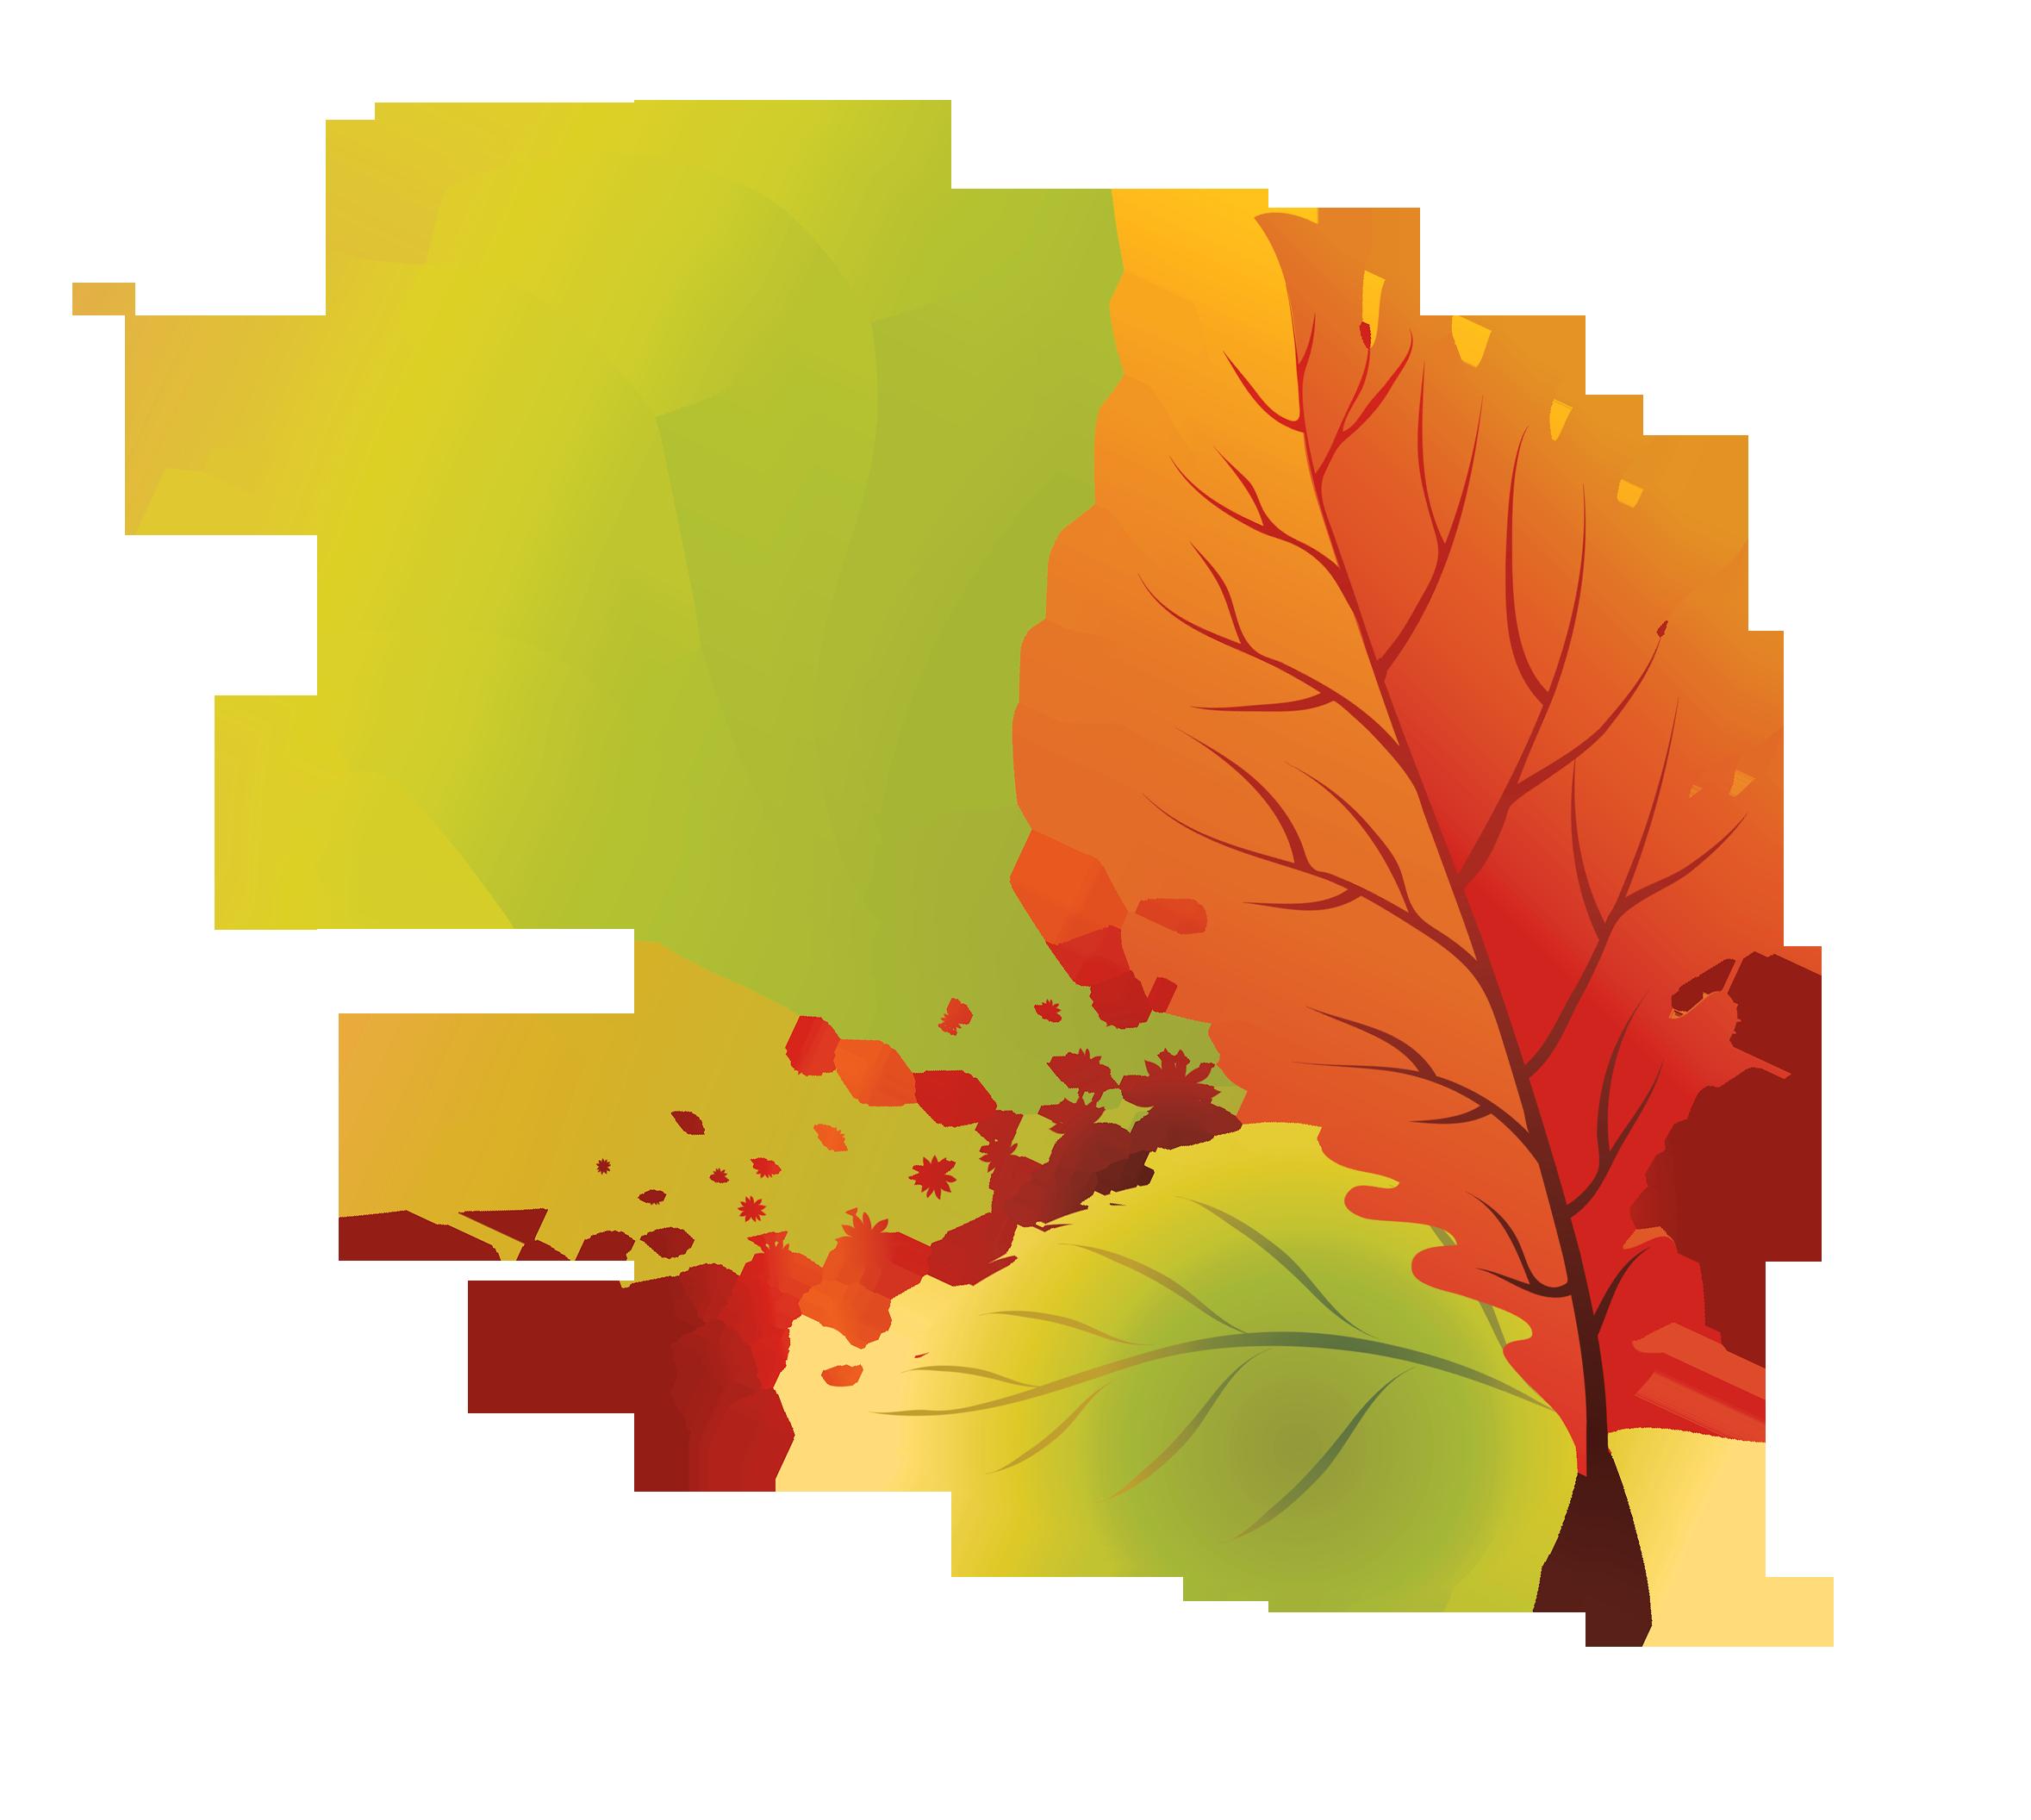 Fall leaves clip art beautiful autumn clipart 2 image #10233.